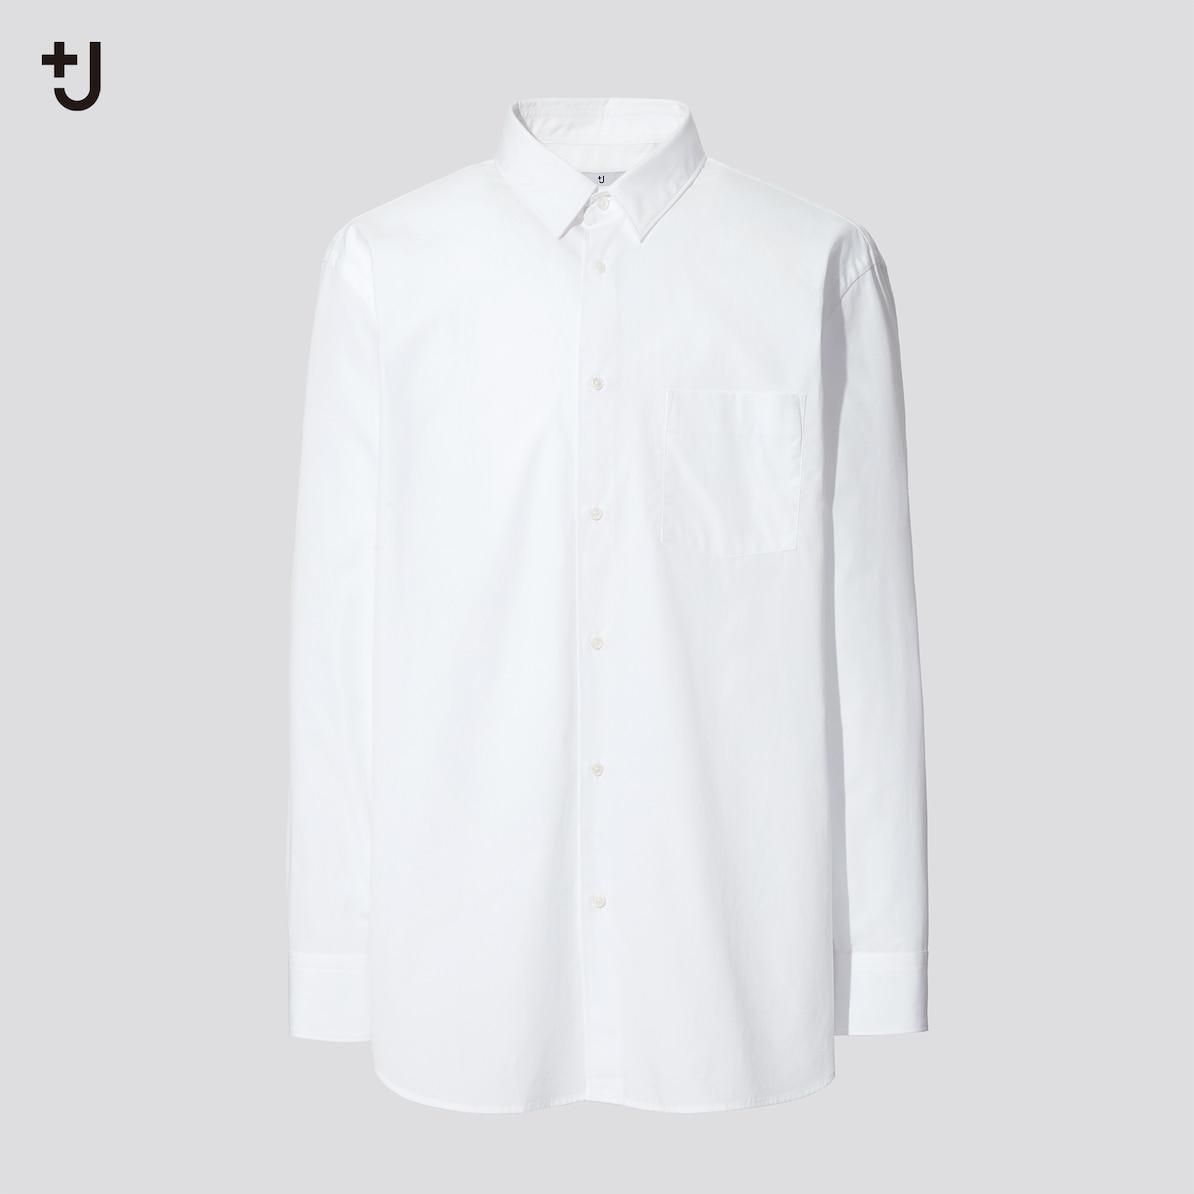 https://image.uniqlo.com/UQ/ST3/AsianCommon/imagesgoods/436108/item/goods_00_436108.jpg?width=1194